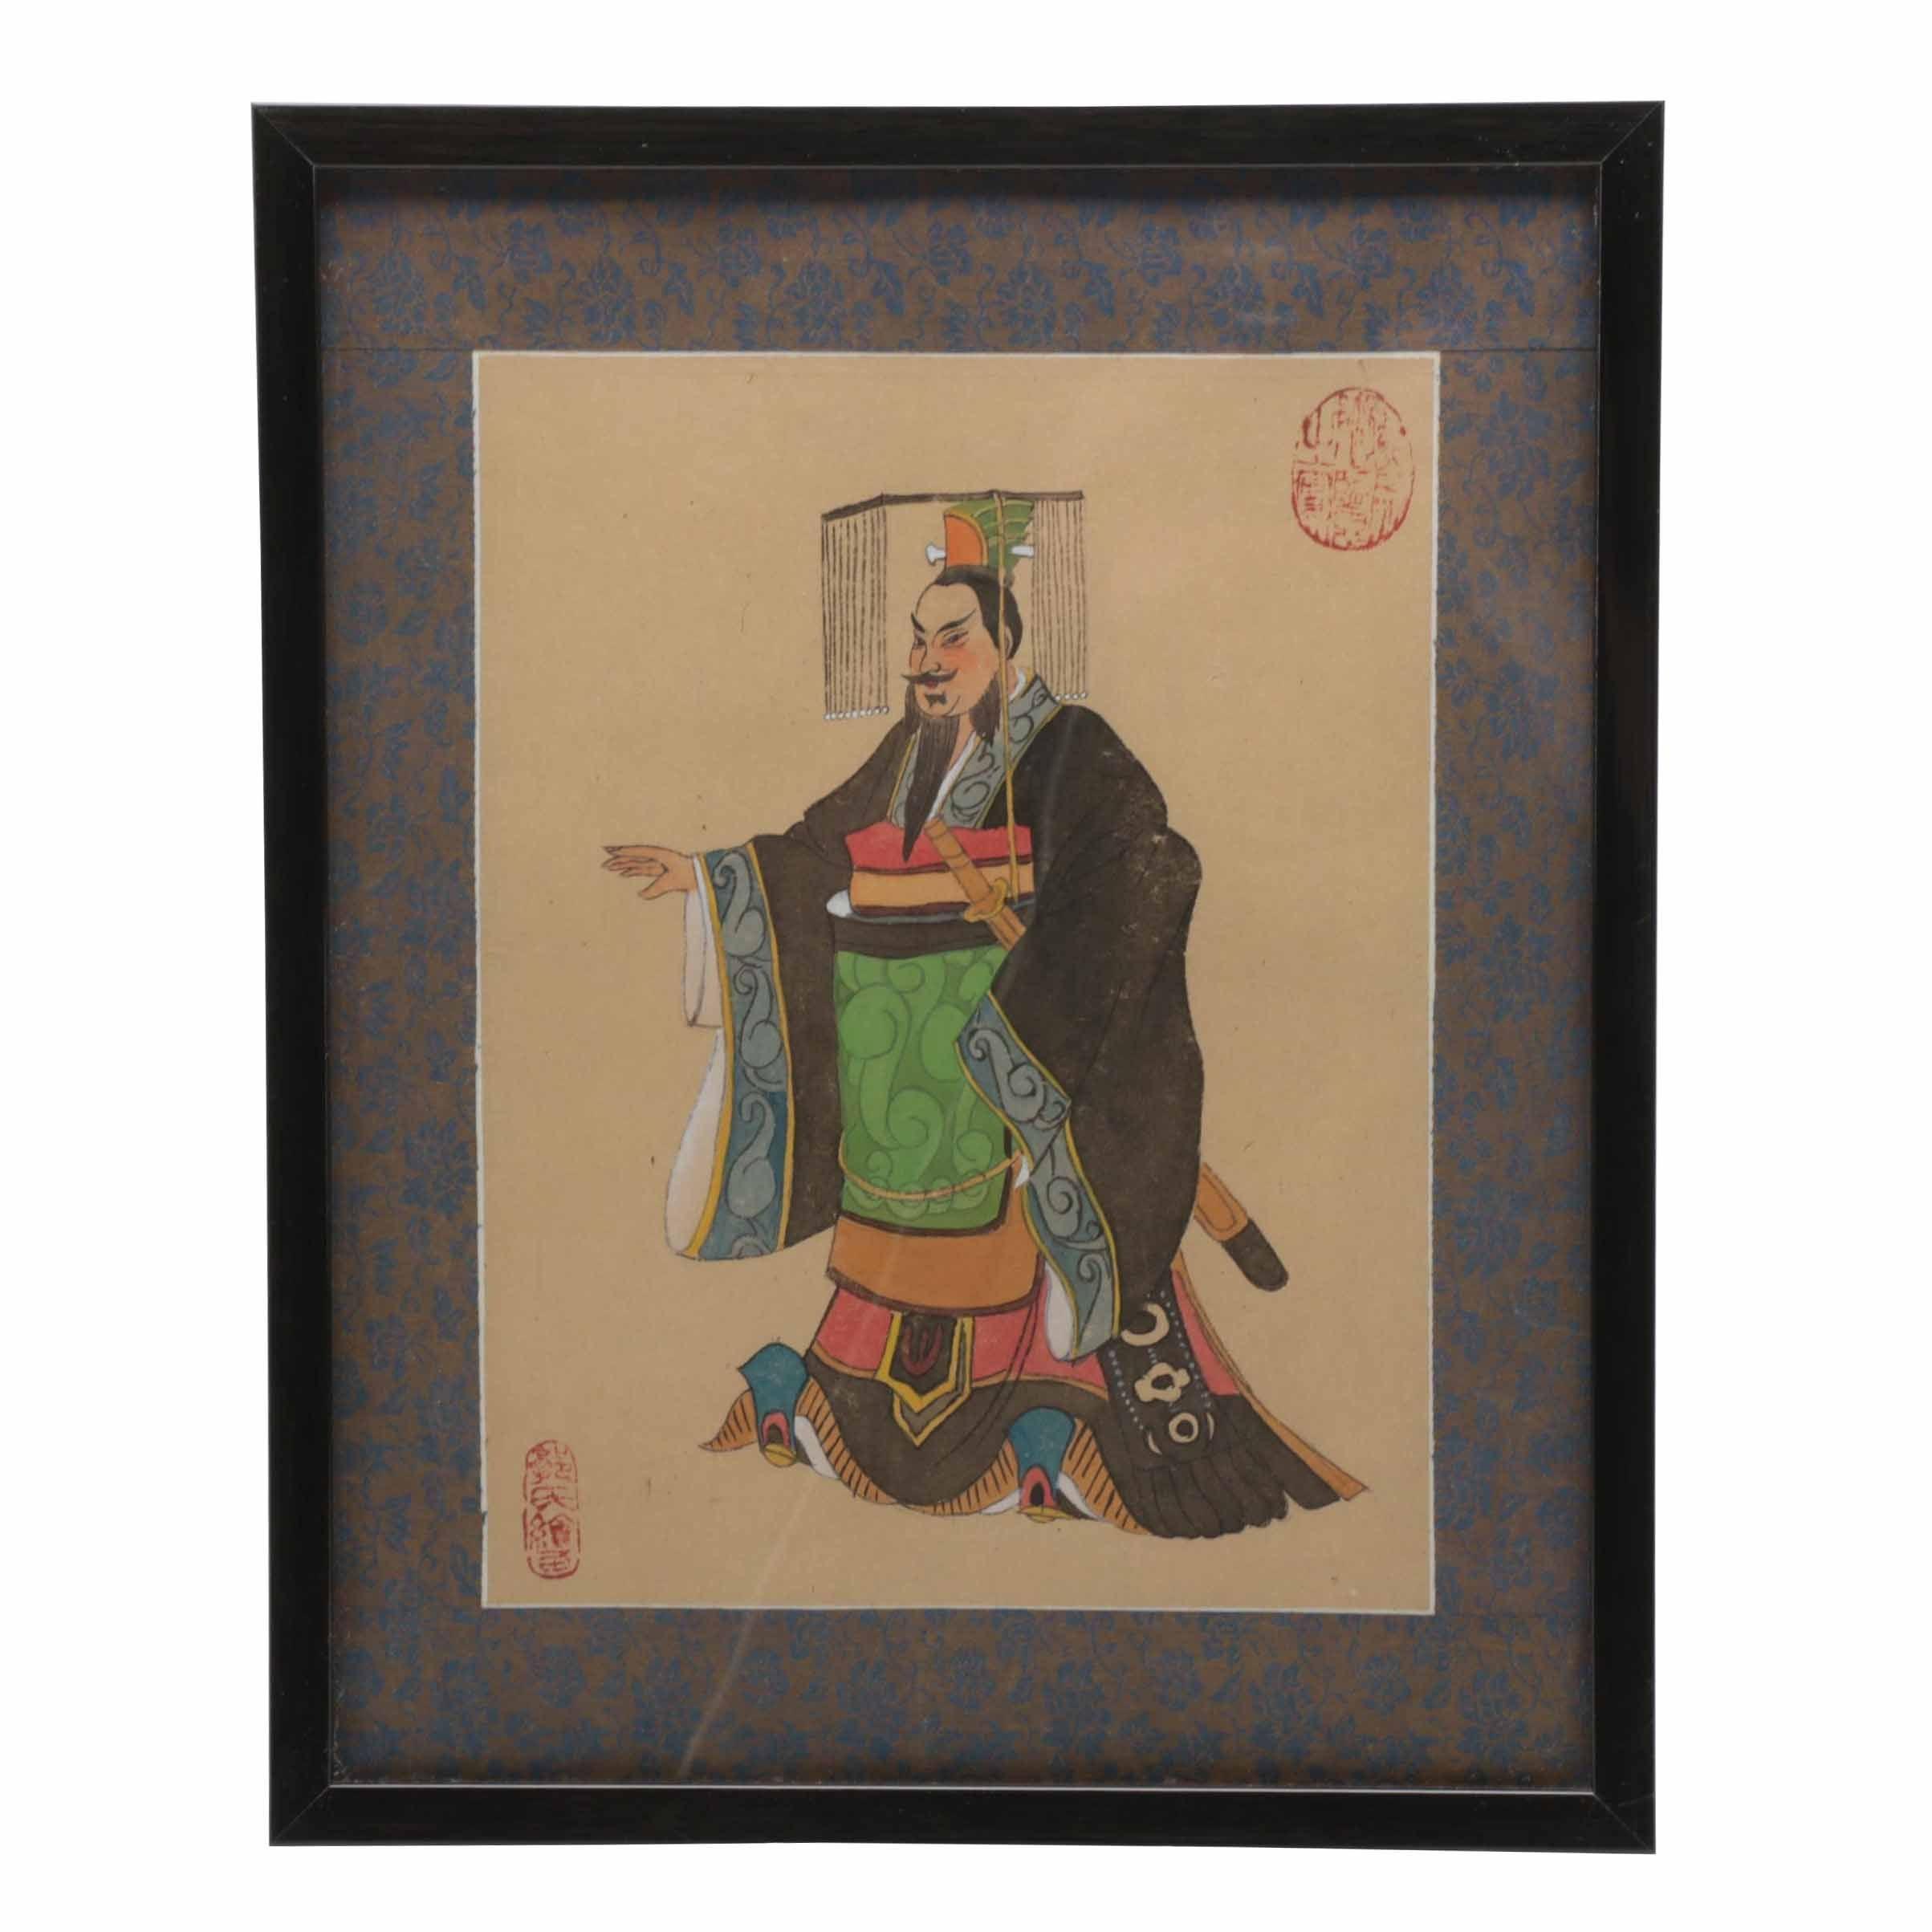 Original Gouache and Watercolor Painting of Samurai